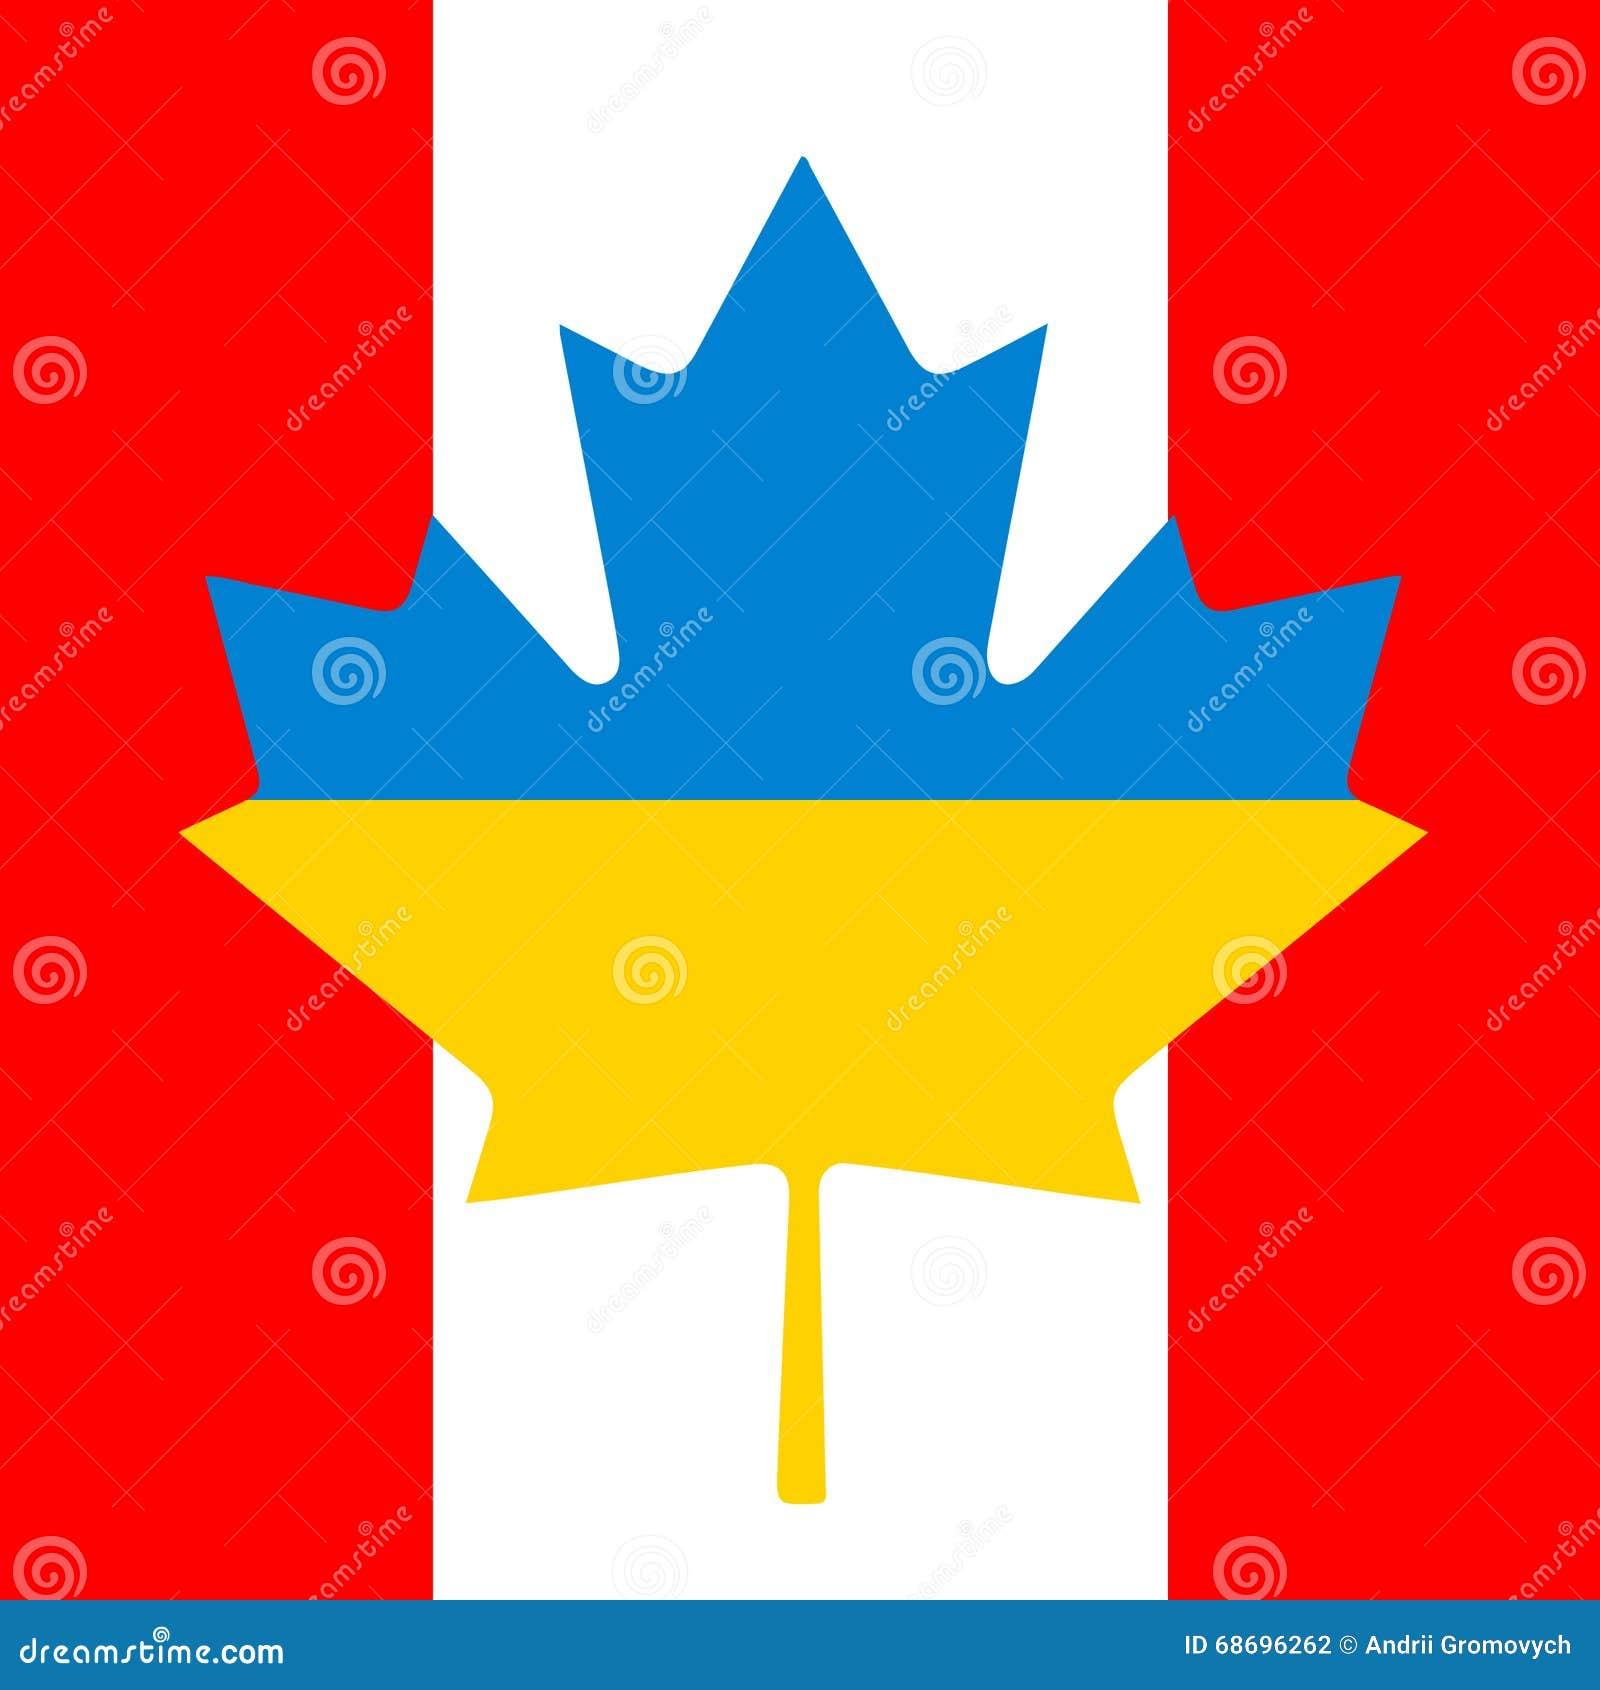 canada ukraine flag friendship stock vector image 68696262